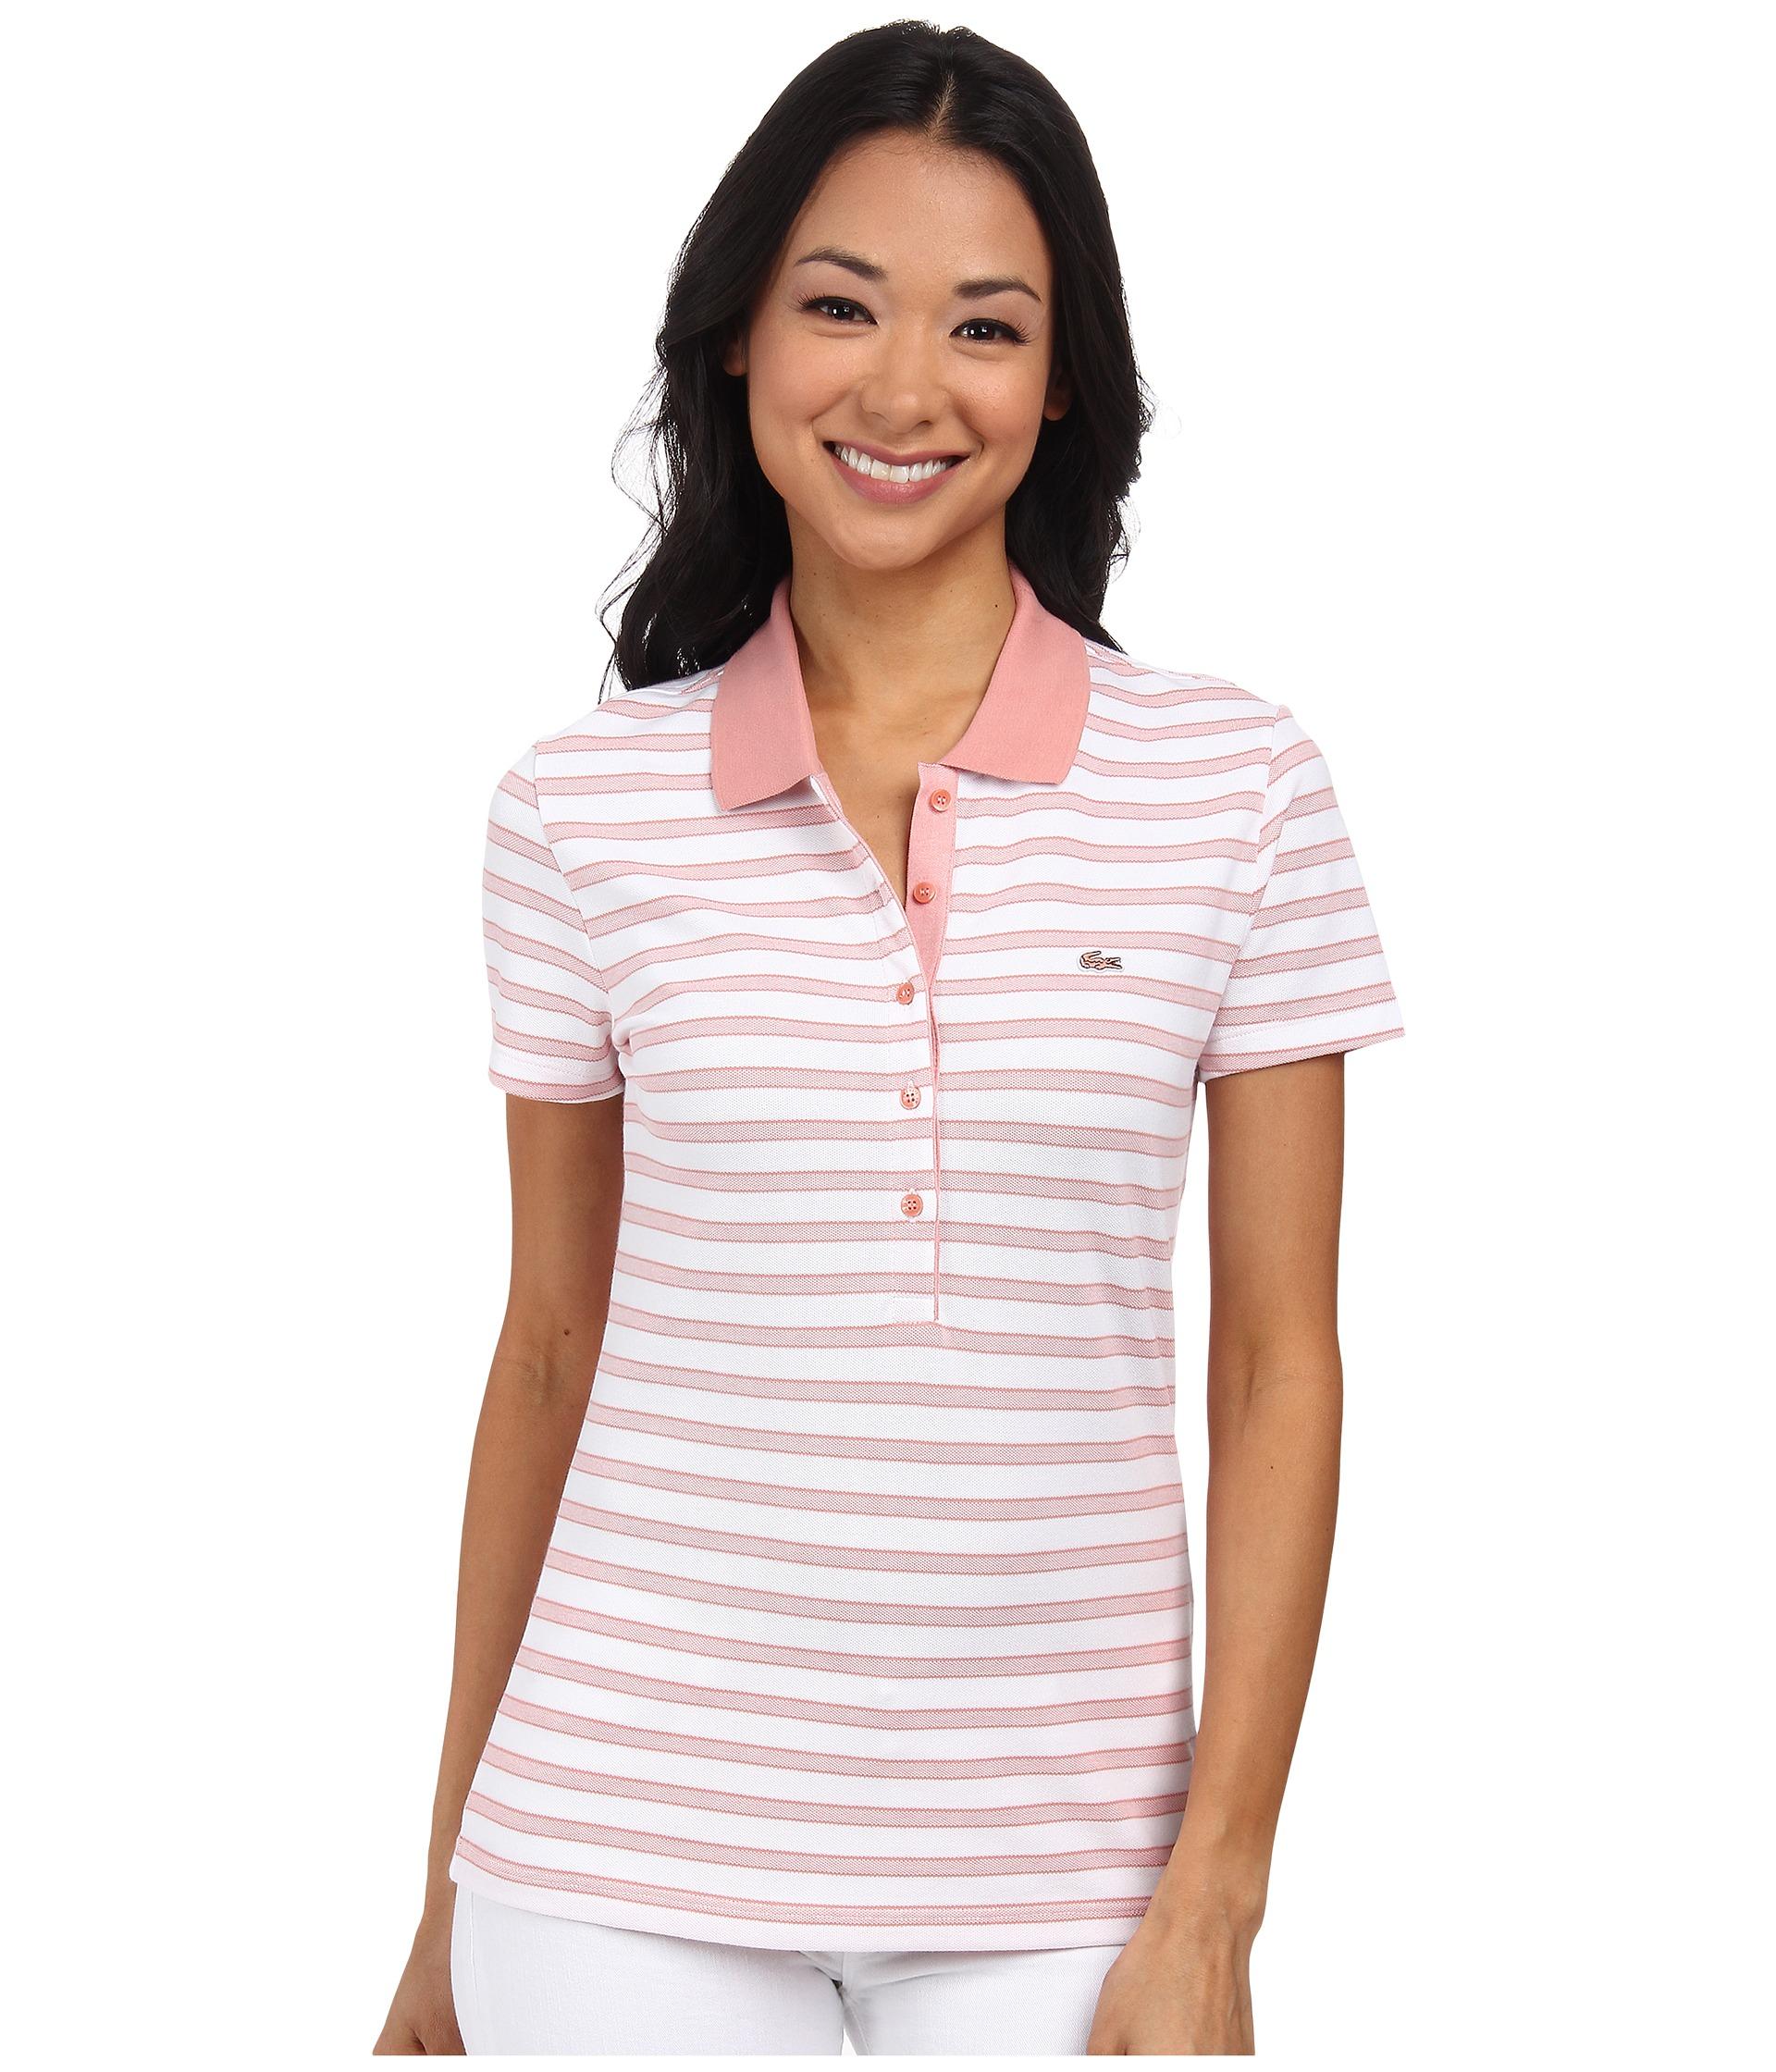 65d7edf5c0 Lacoste Polo Shirt Ladies - DREAMWORKS